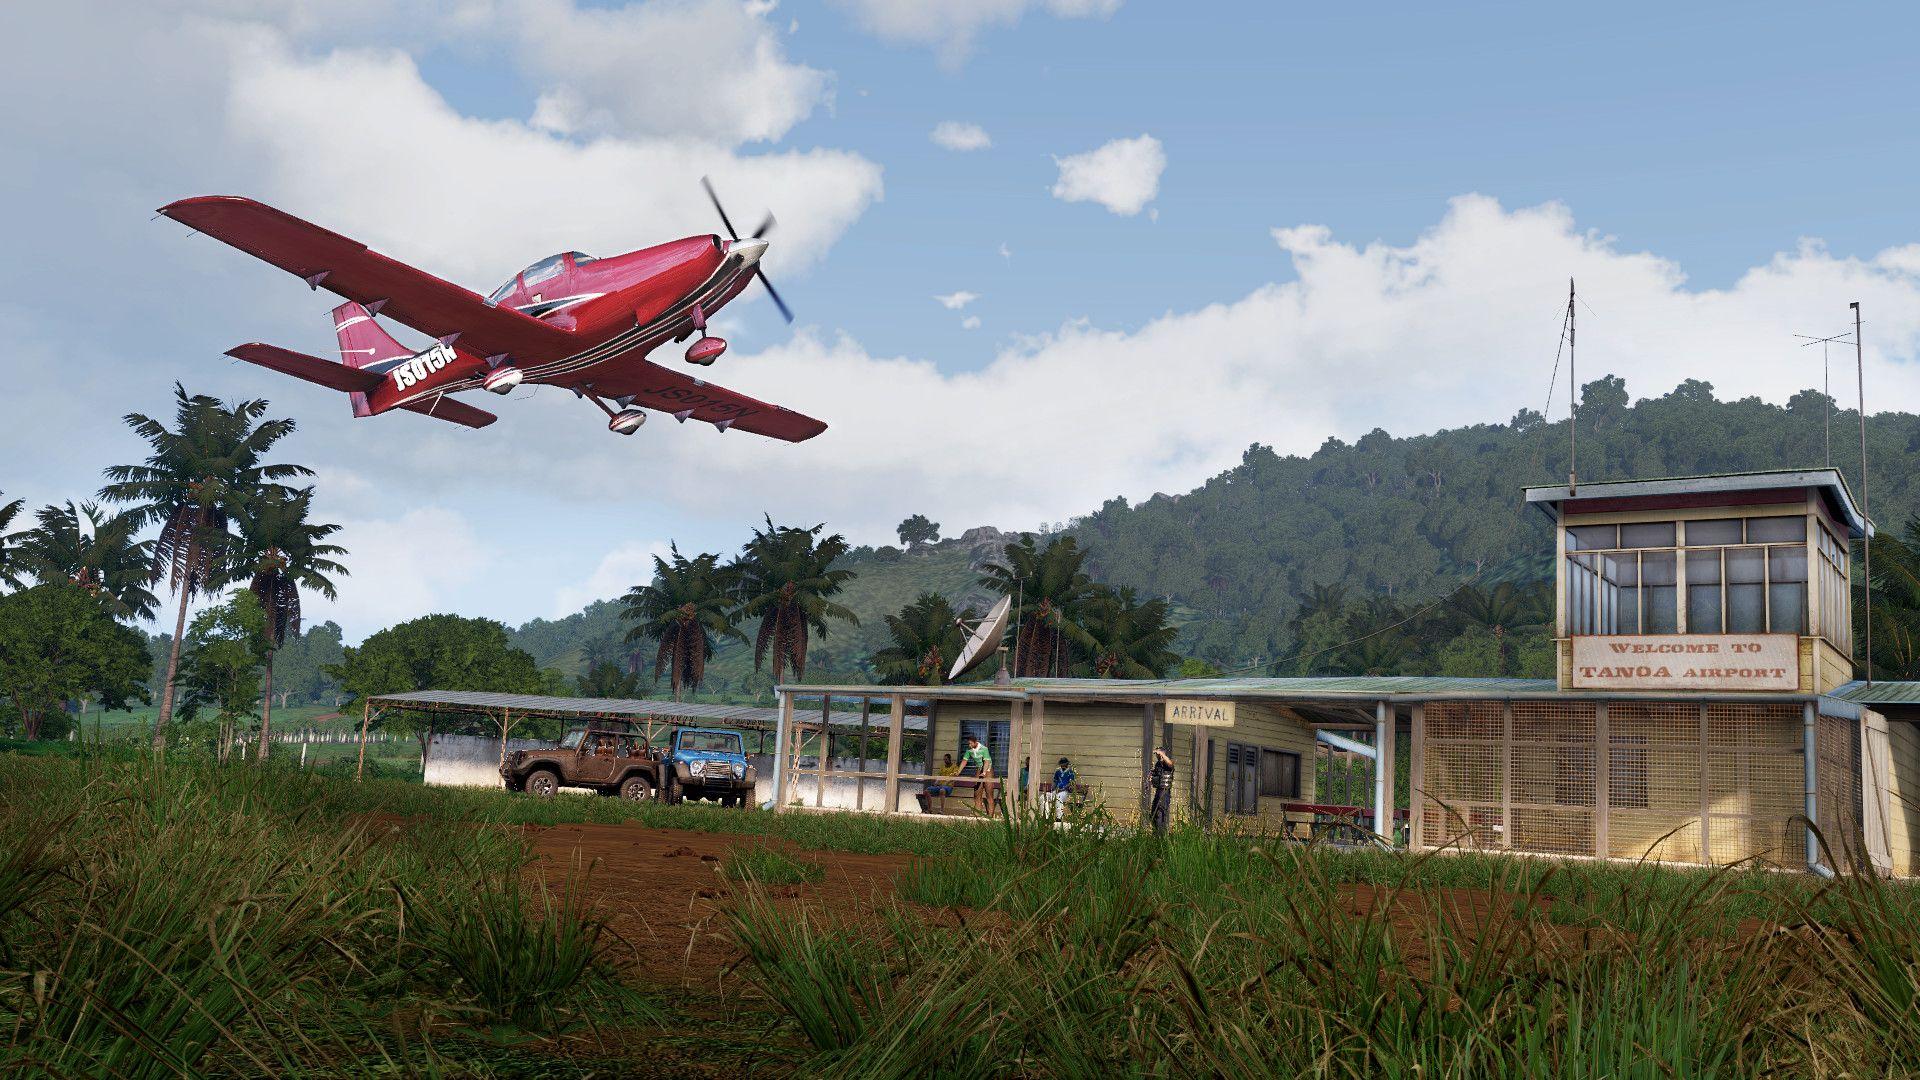 Jungle Airport An Airplane Arma 3 Apex Gaming 3d Graphics Arma 3 Apex Arma 3 Games